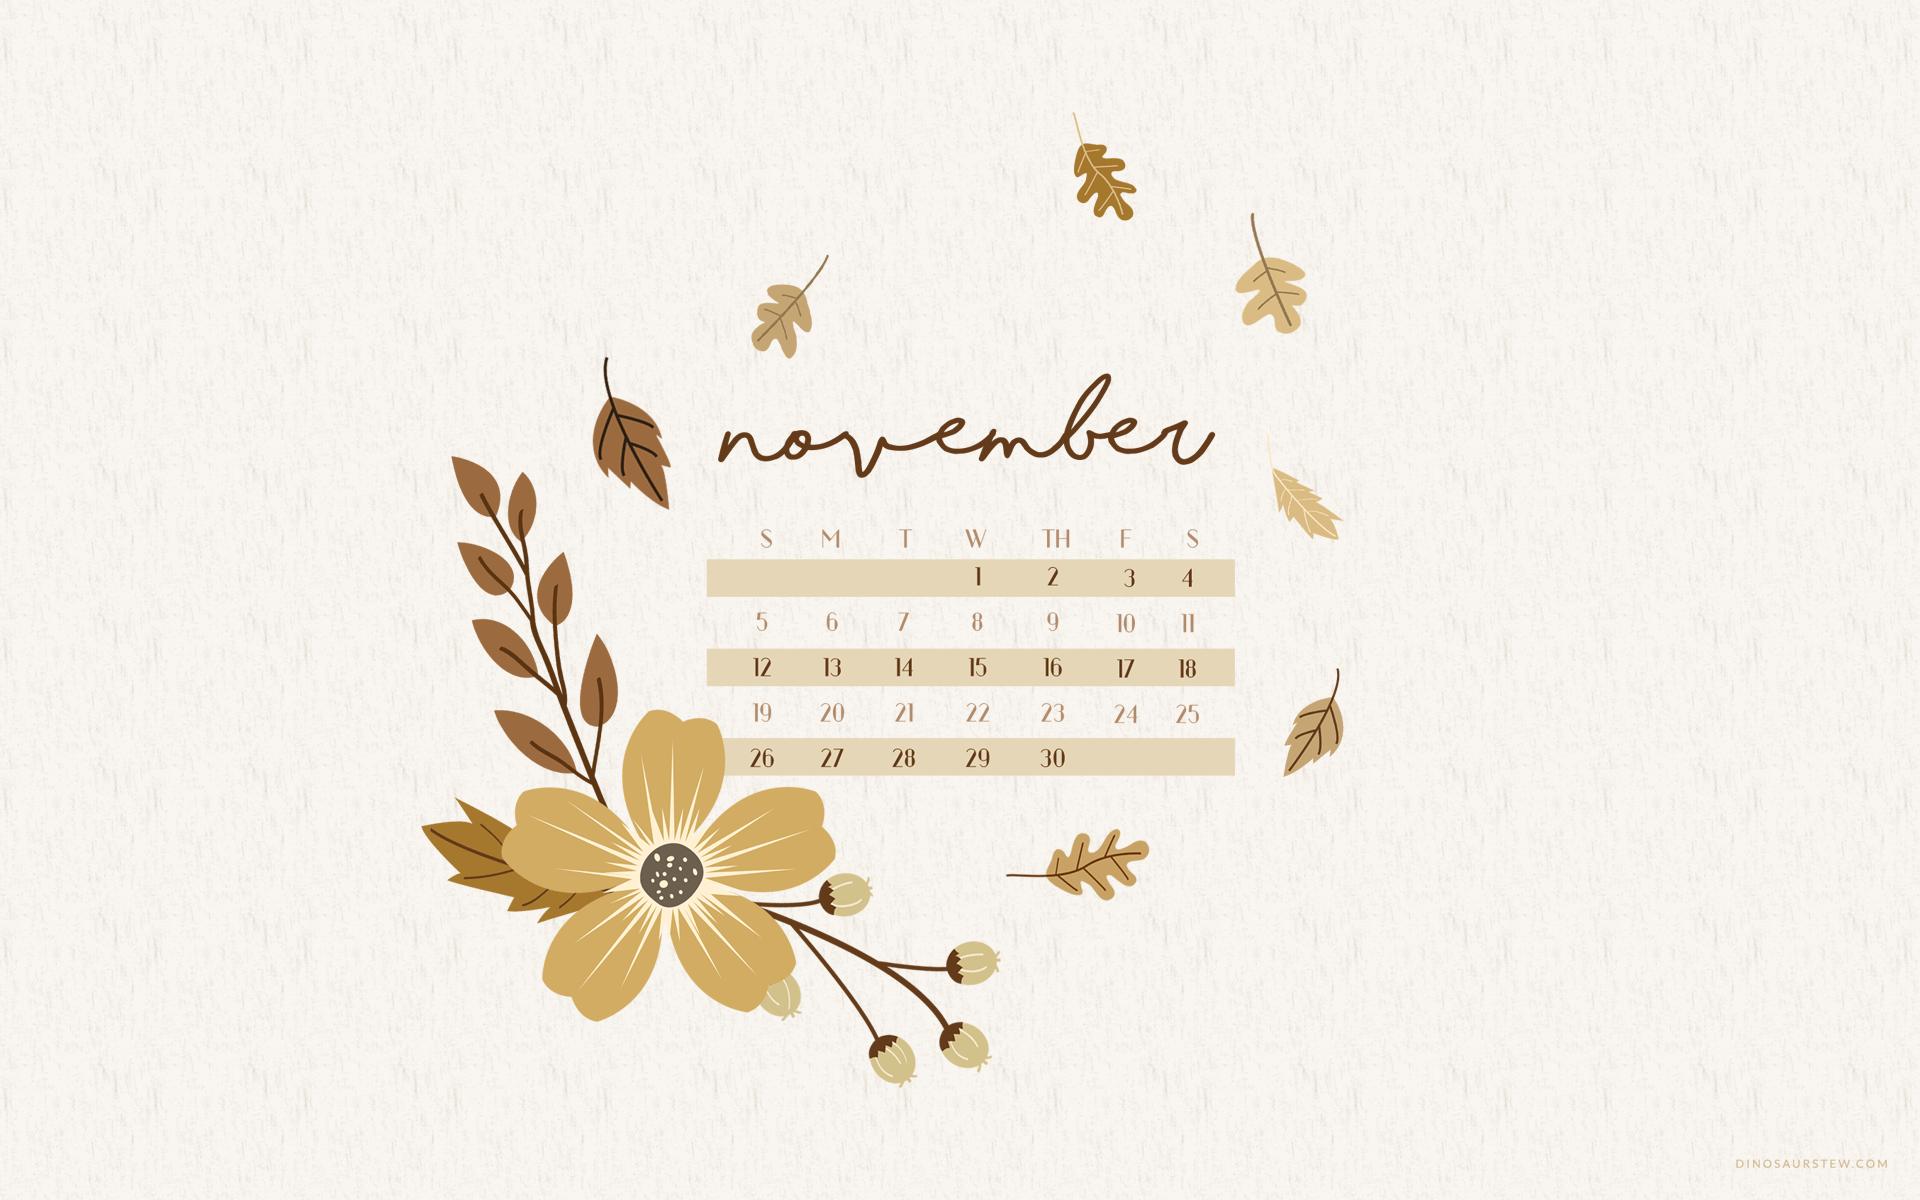 November 2018 Calendar Wallpapers Wallpaper Cave